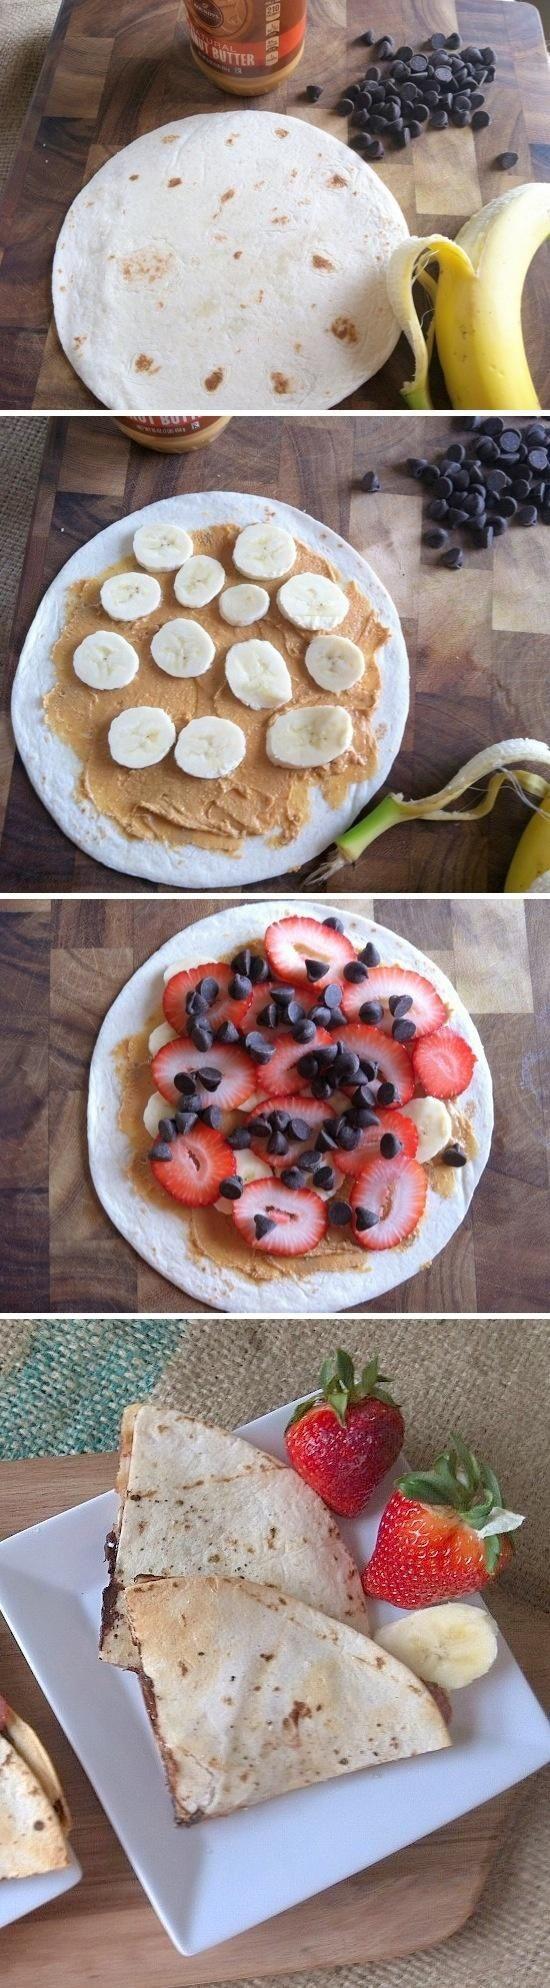 Healthy Breakfast Quesadilla  Breakfast Quesadillas Tortilla nut butter strawberries